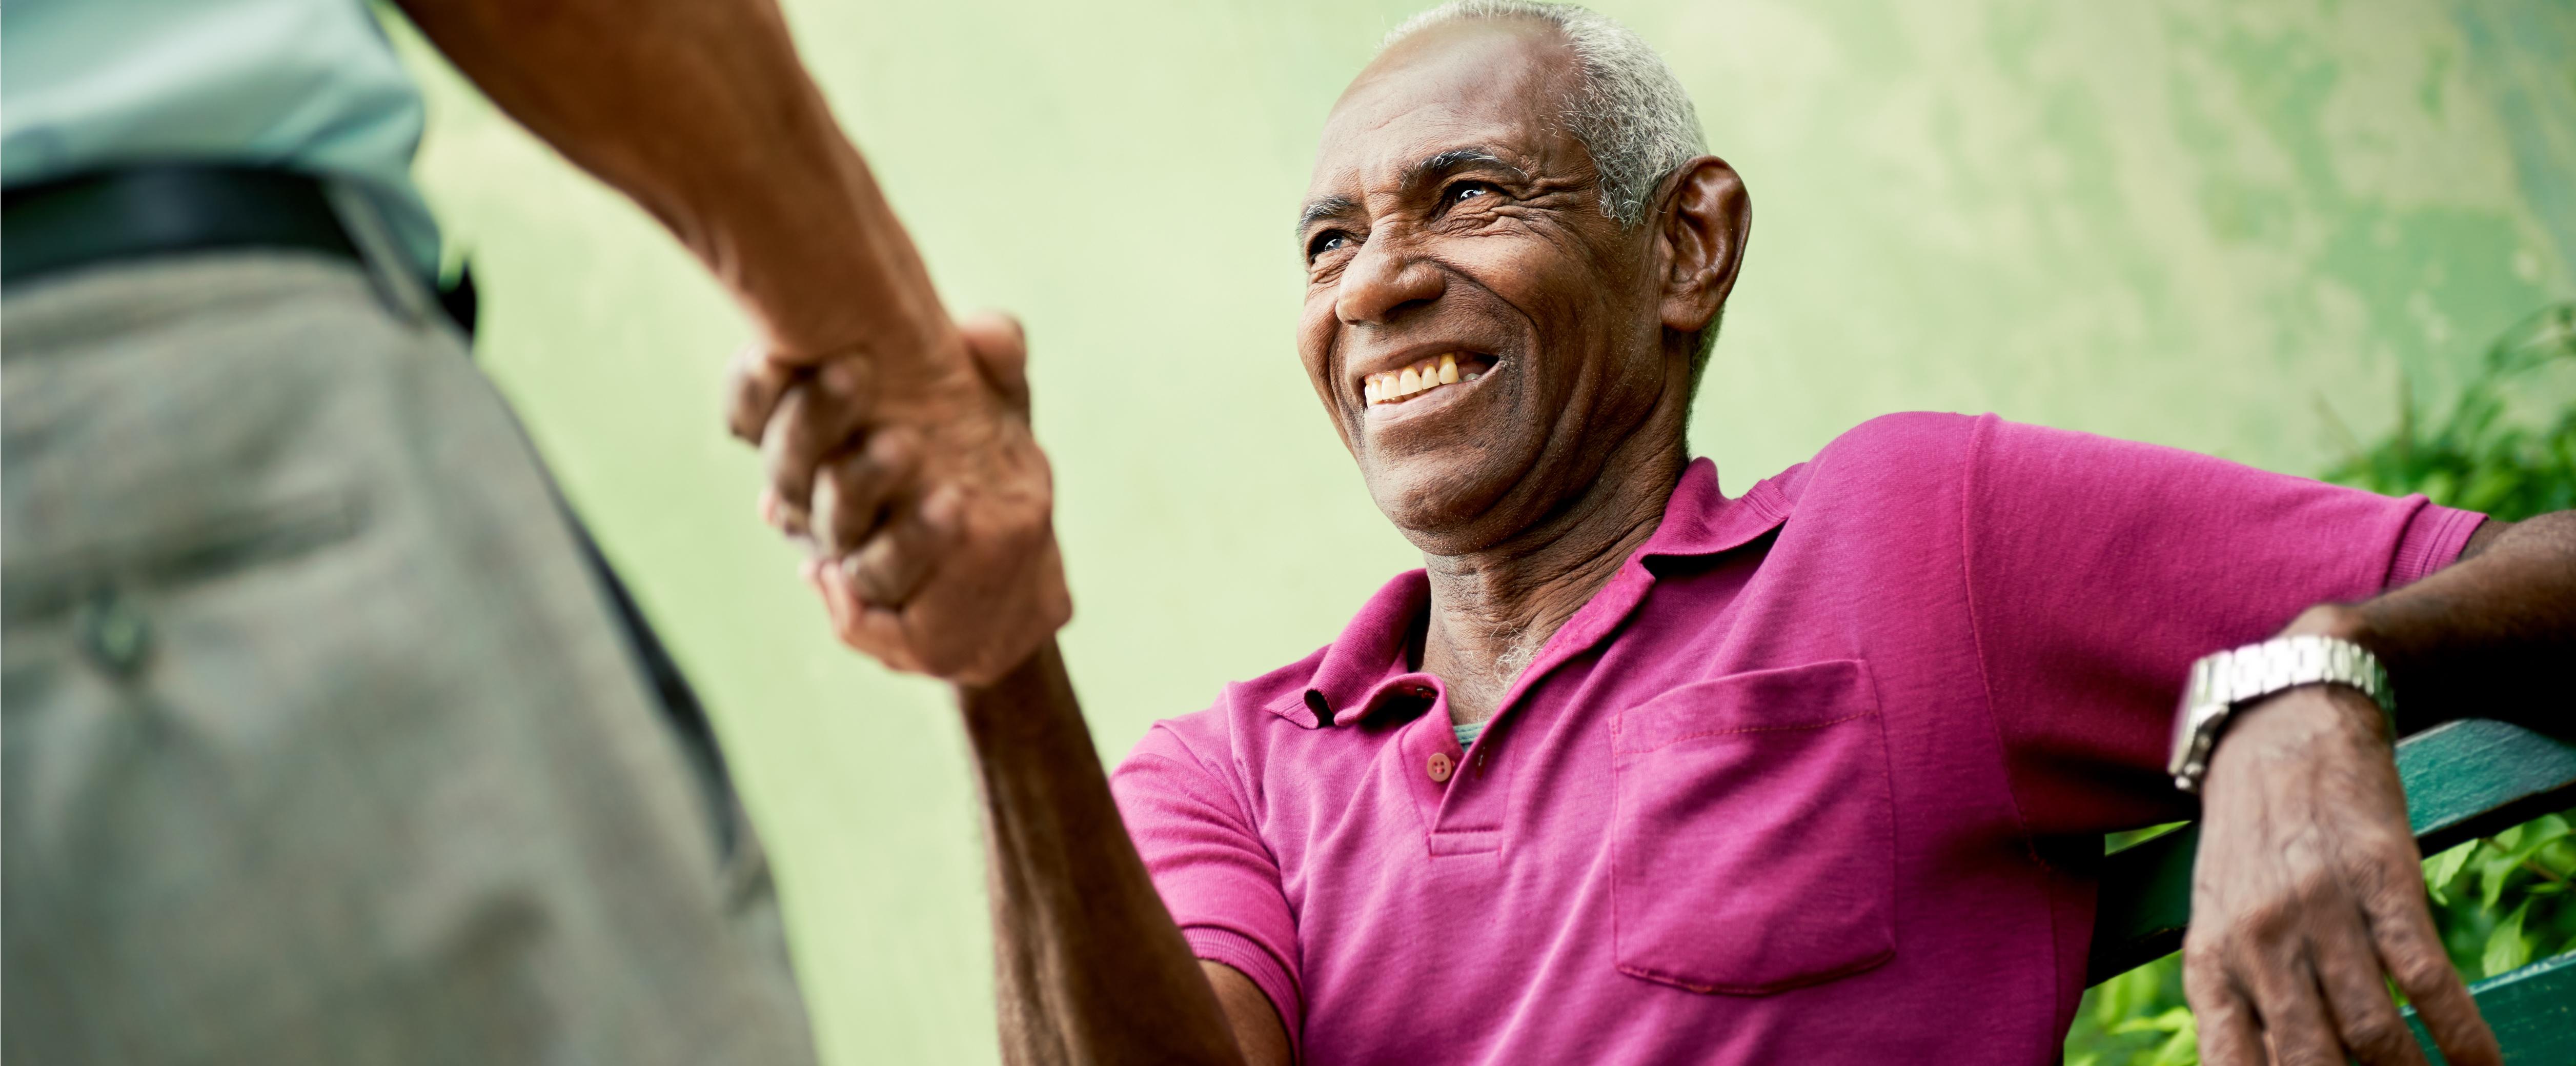 Dewcare - Elderly care South Africa Hermanus